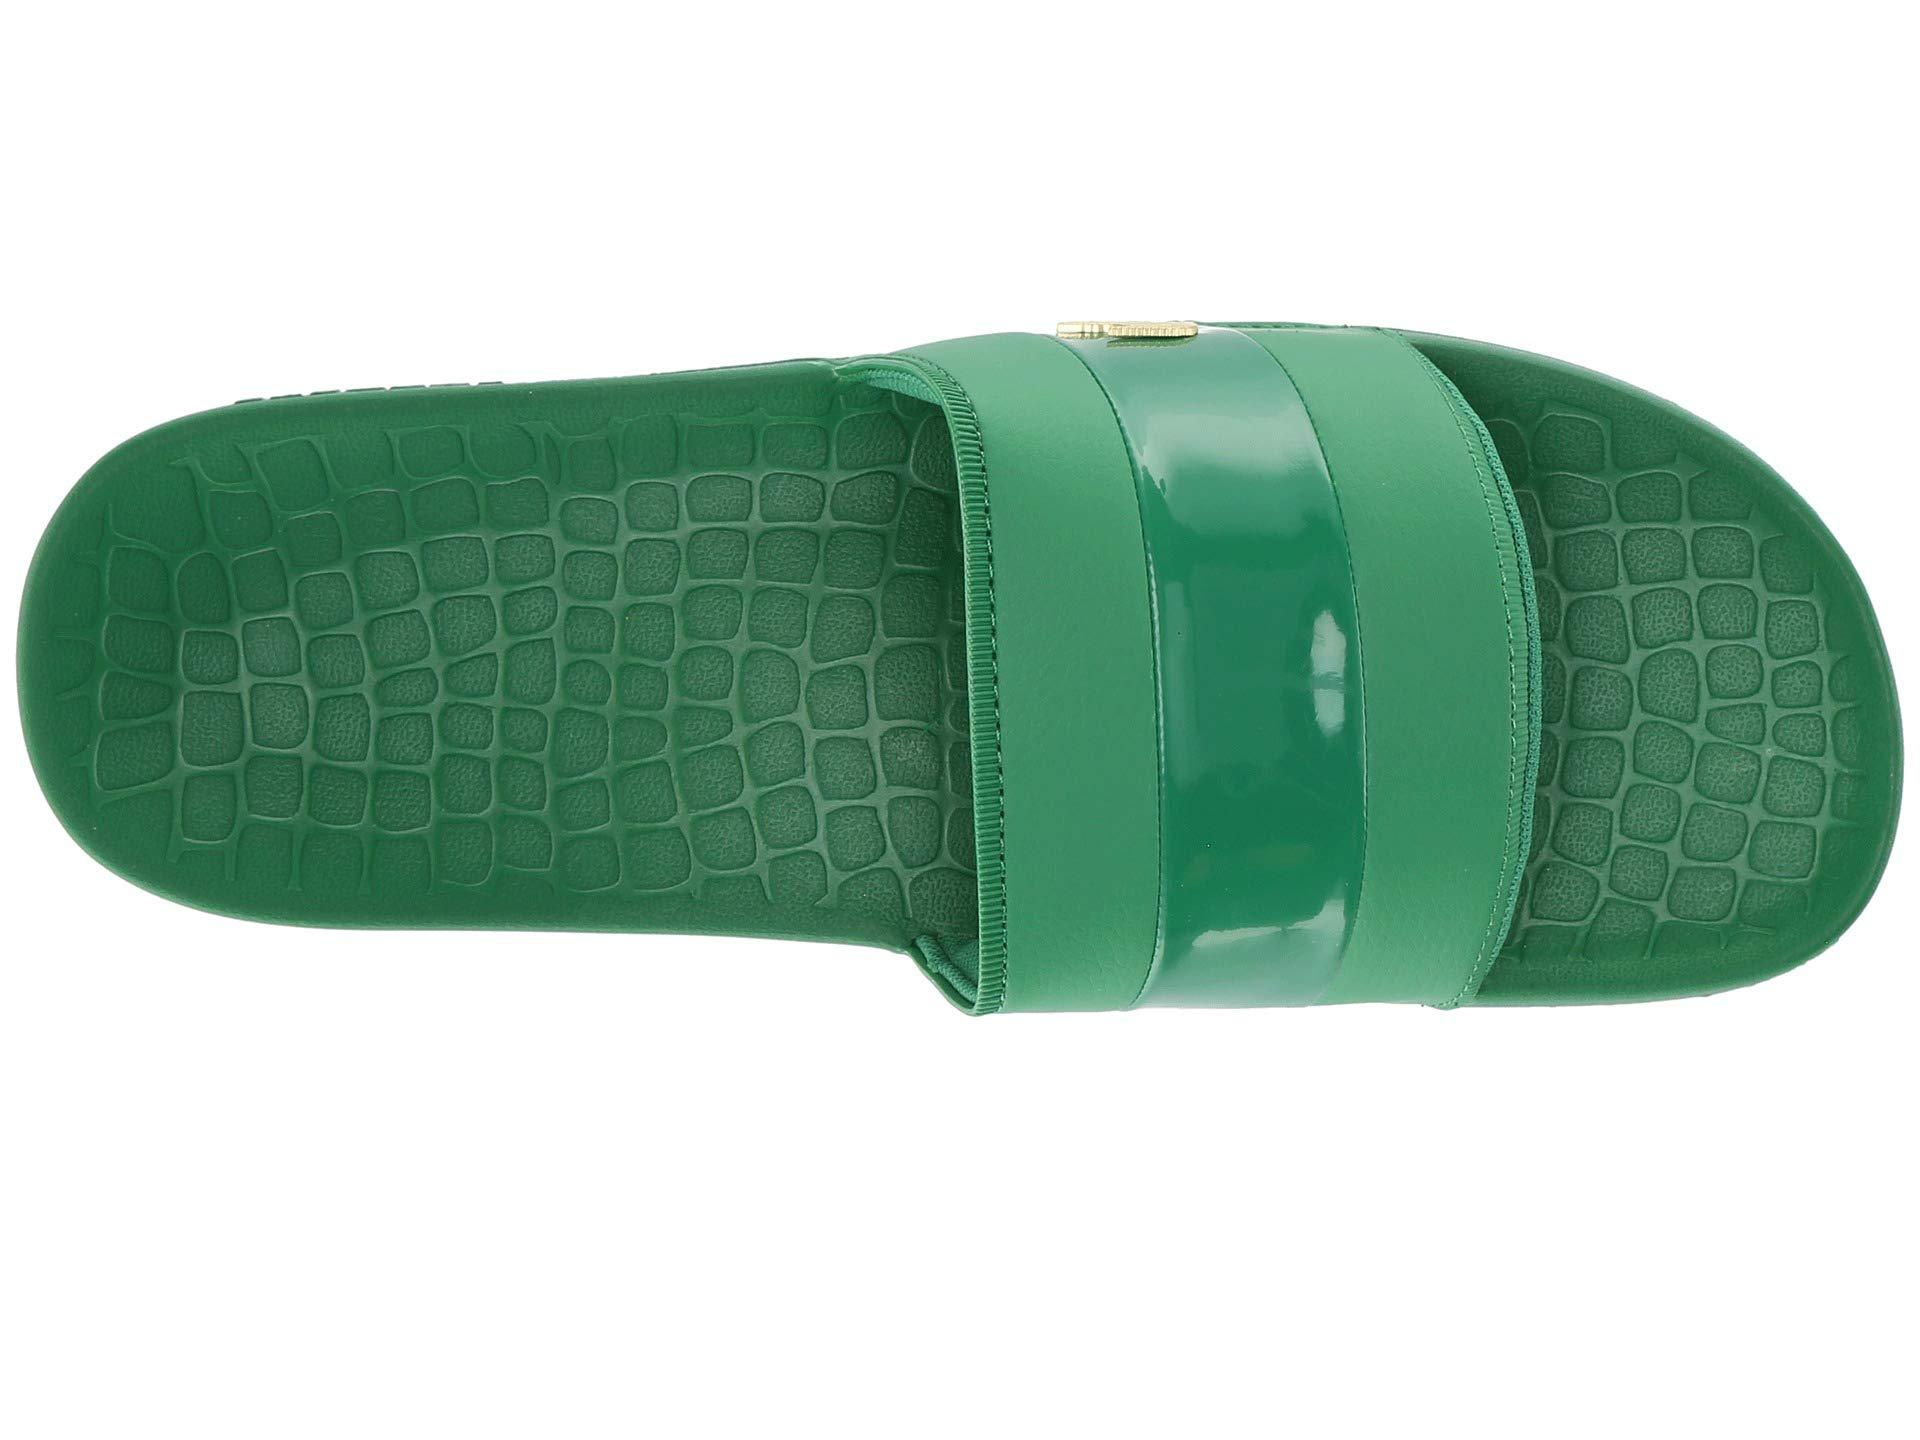 2e09bd98bd5758 Lacoste - Fraisier 118 1 U (green gold) Men s Shoes for Men -. View  fullscreen